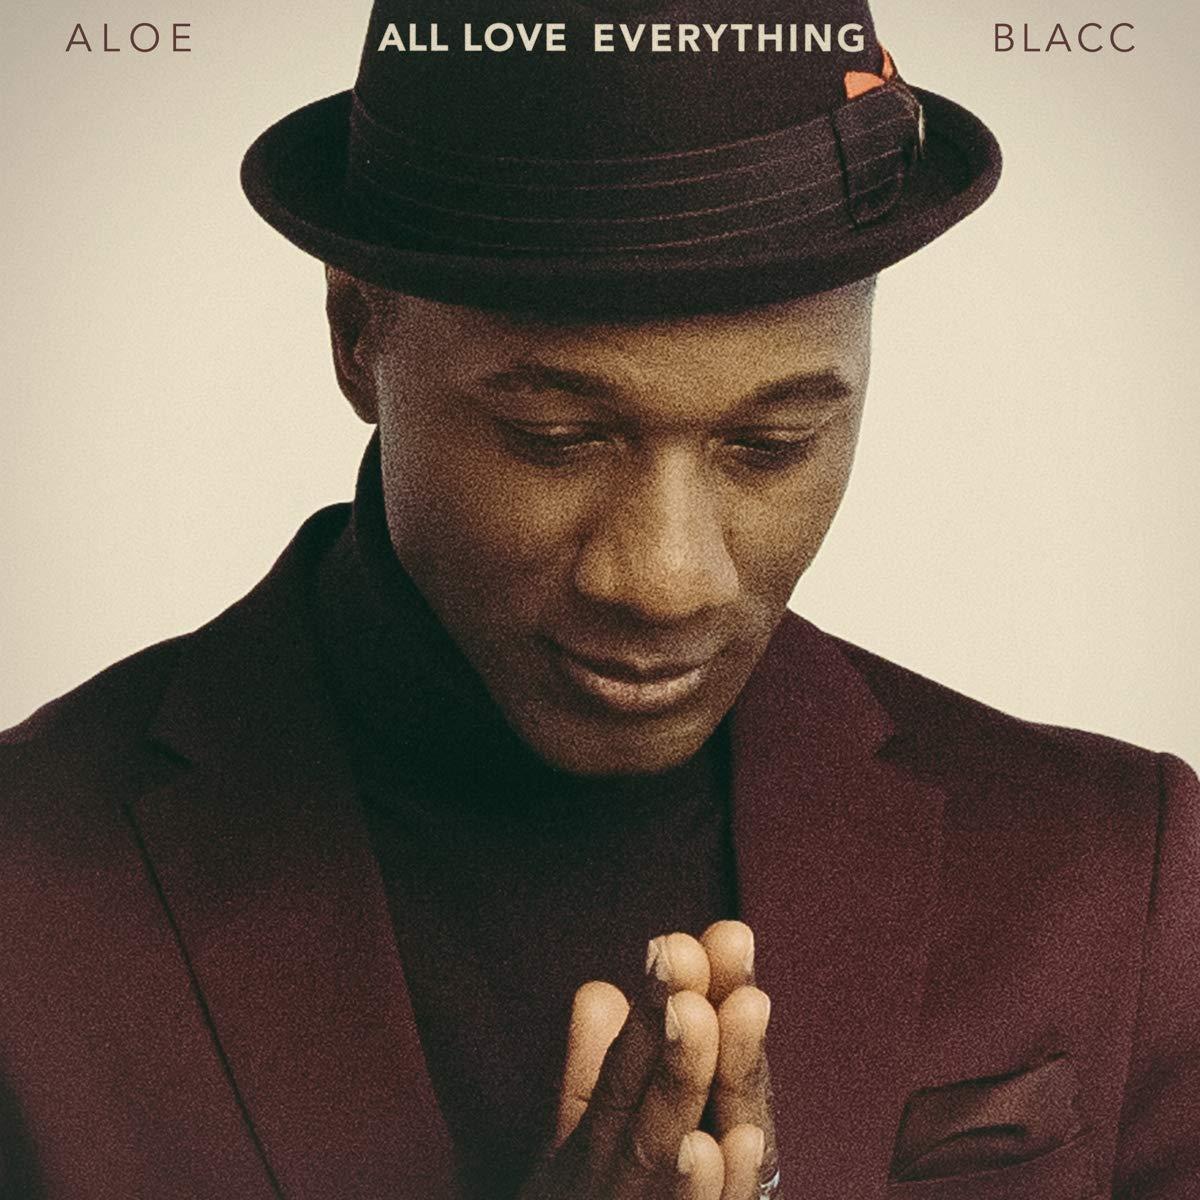 Aloe Blacc – All Love Everything (2020) [FLAC]